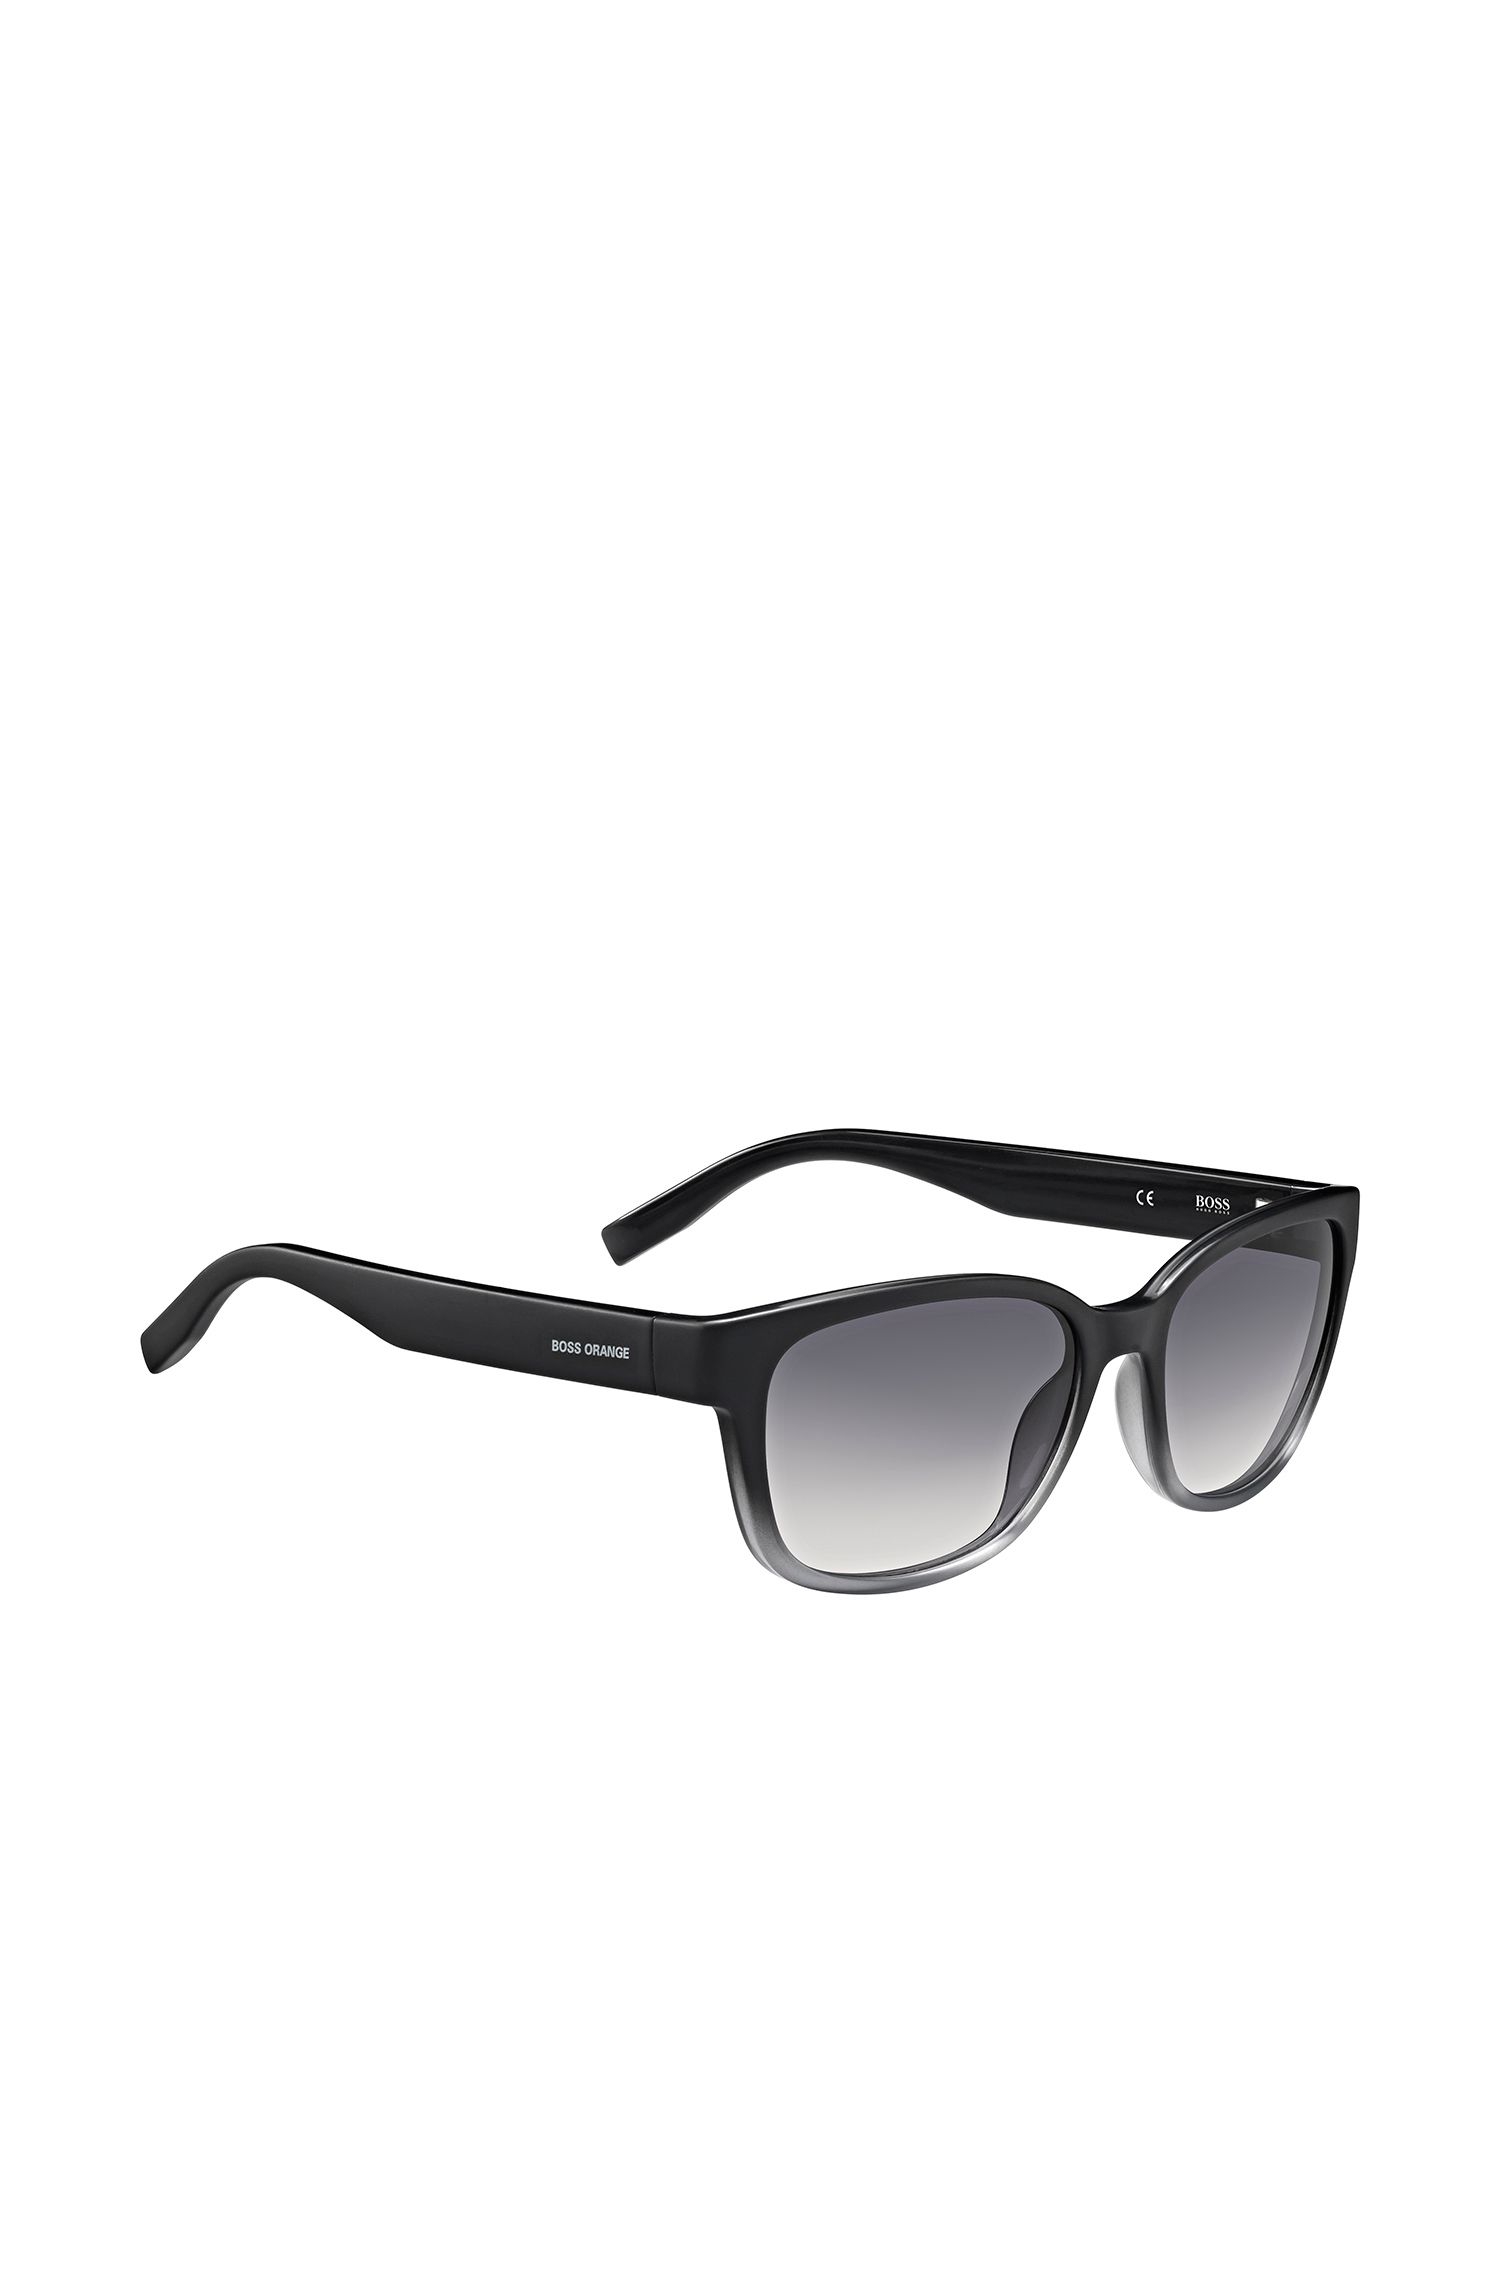 Occhiali da sole neri e grigi in stile Cat Eye: 'BO0251/1'